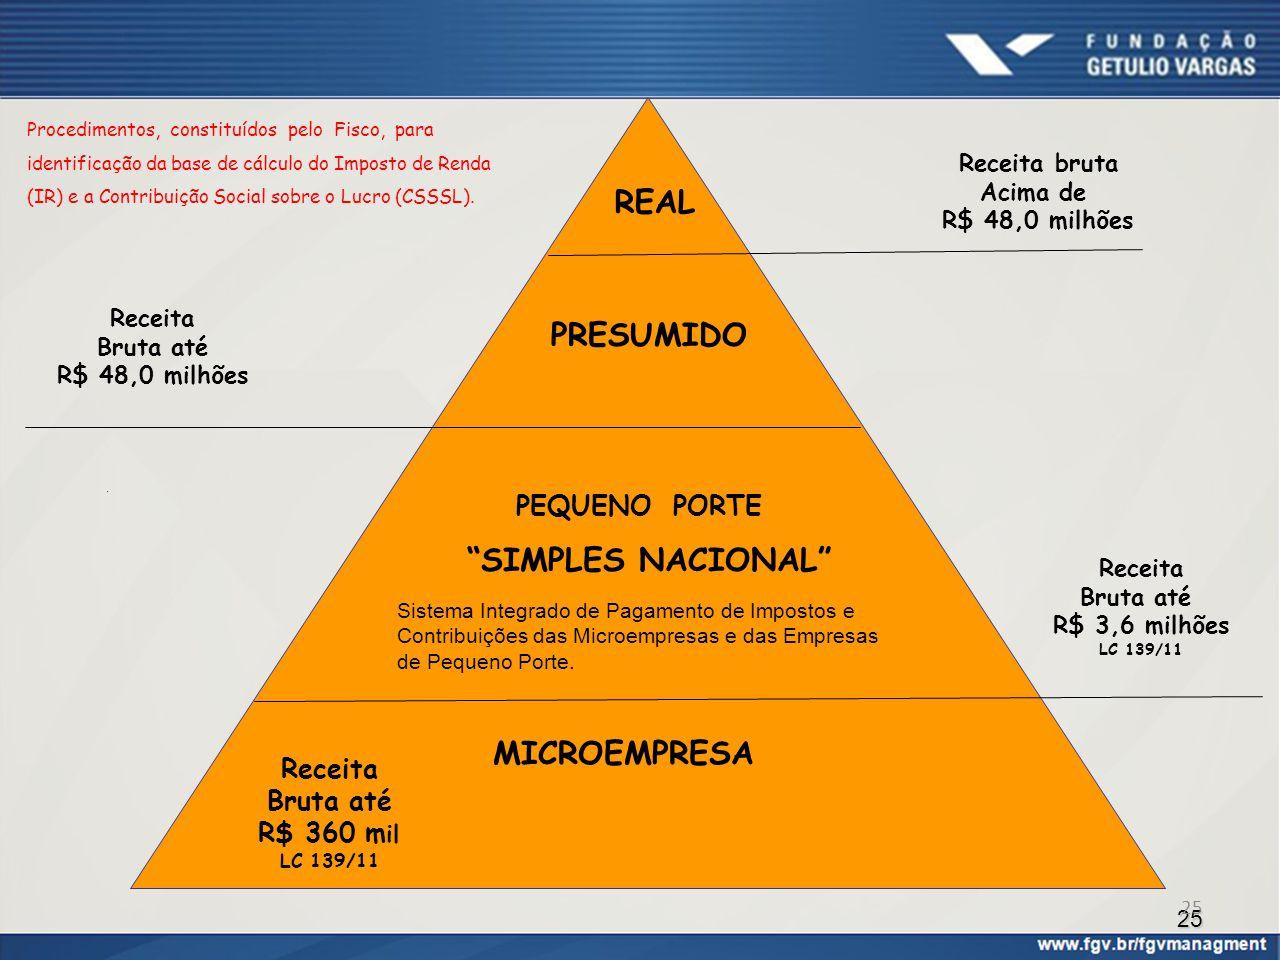 REAL PRESUMIDO SIMPLES NACIONAL MICROEMPRESA